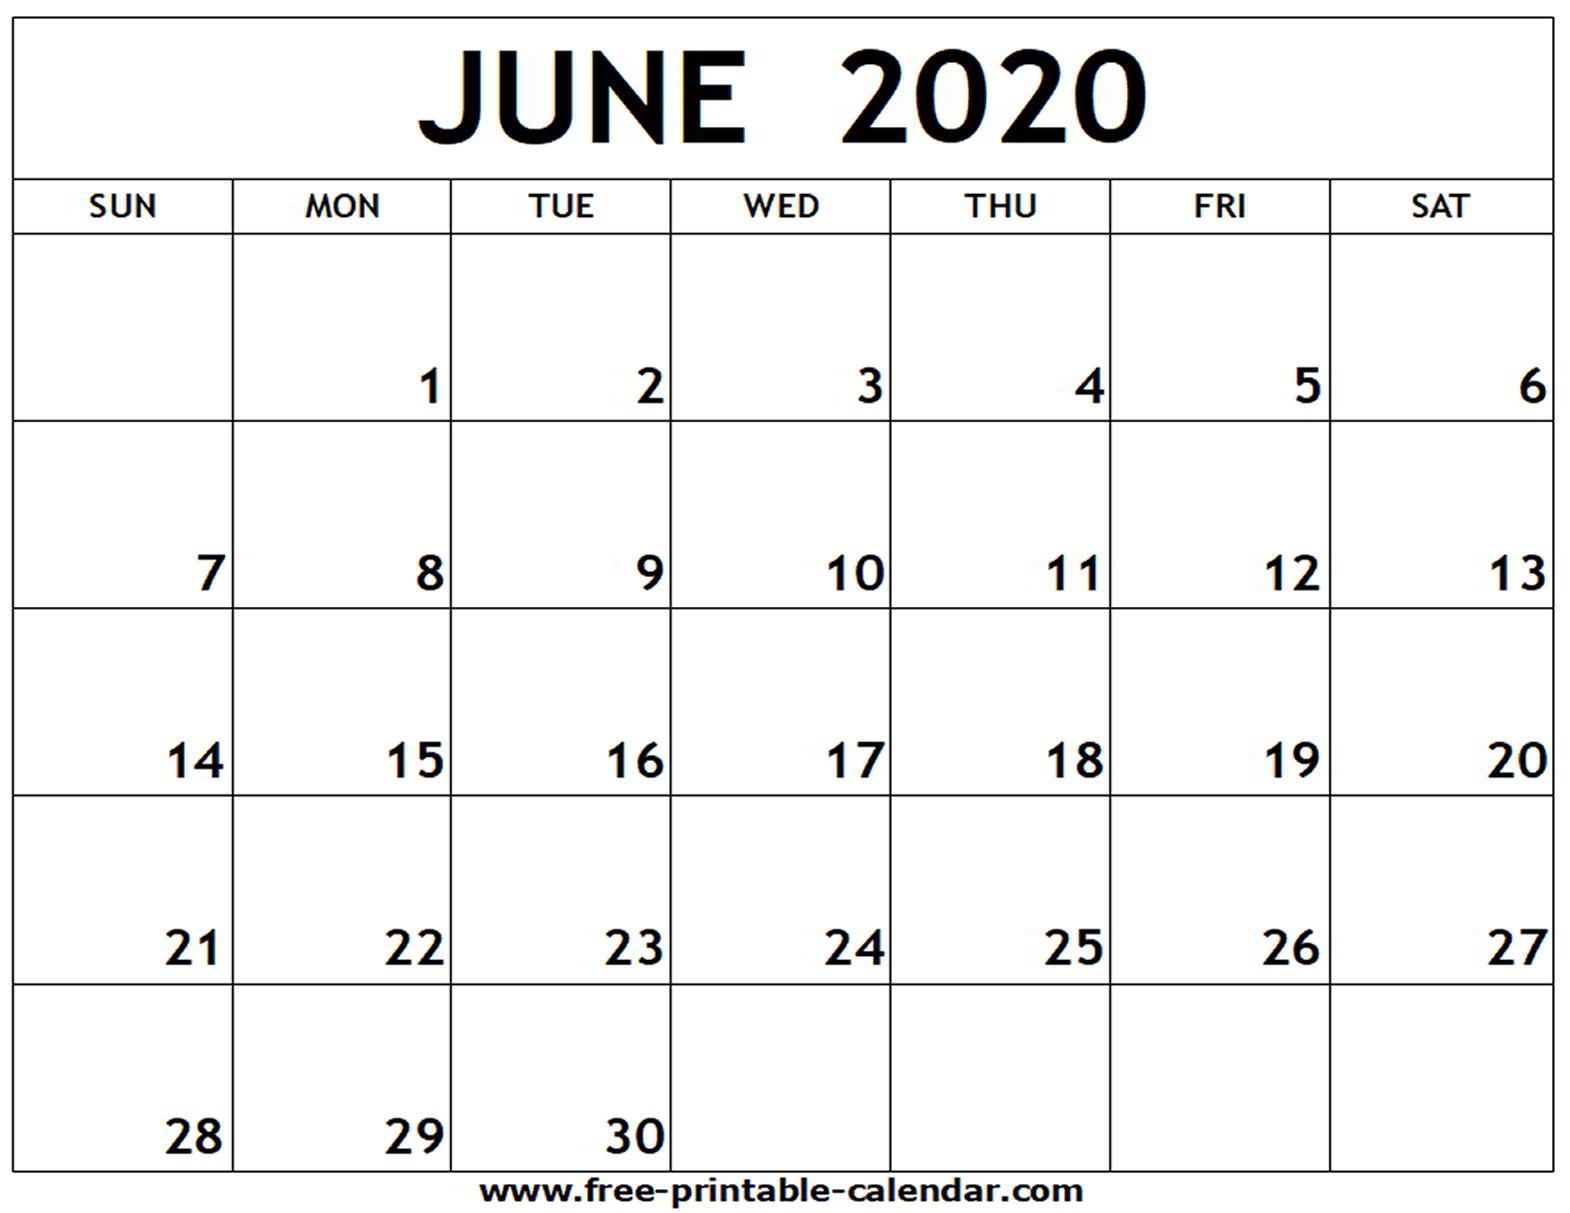 Free Calendar June 2020 - Wpa.wpart.co